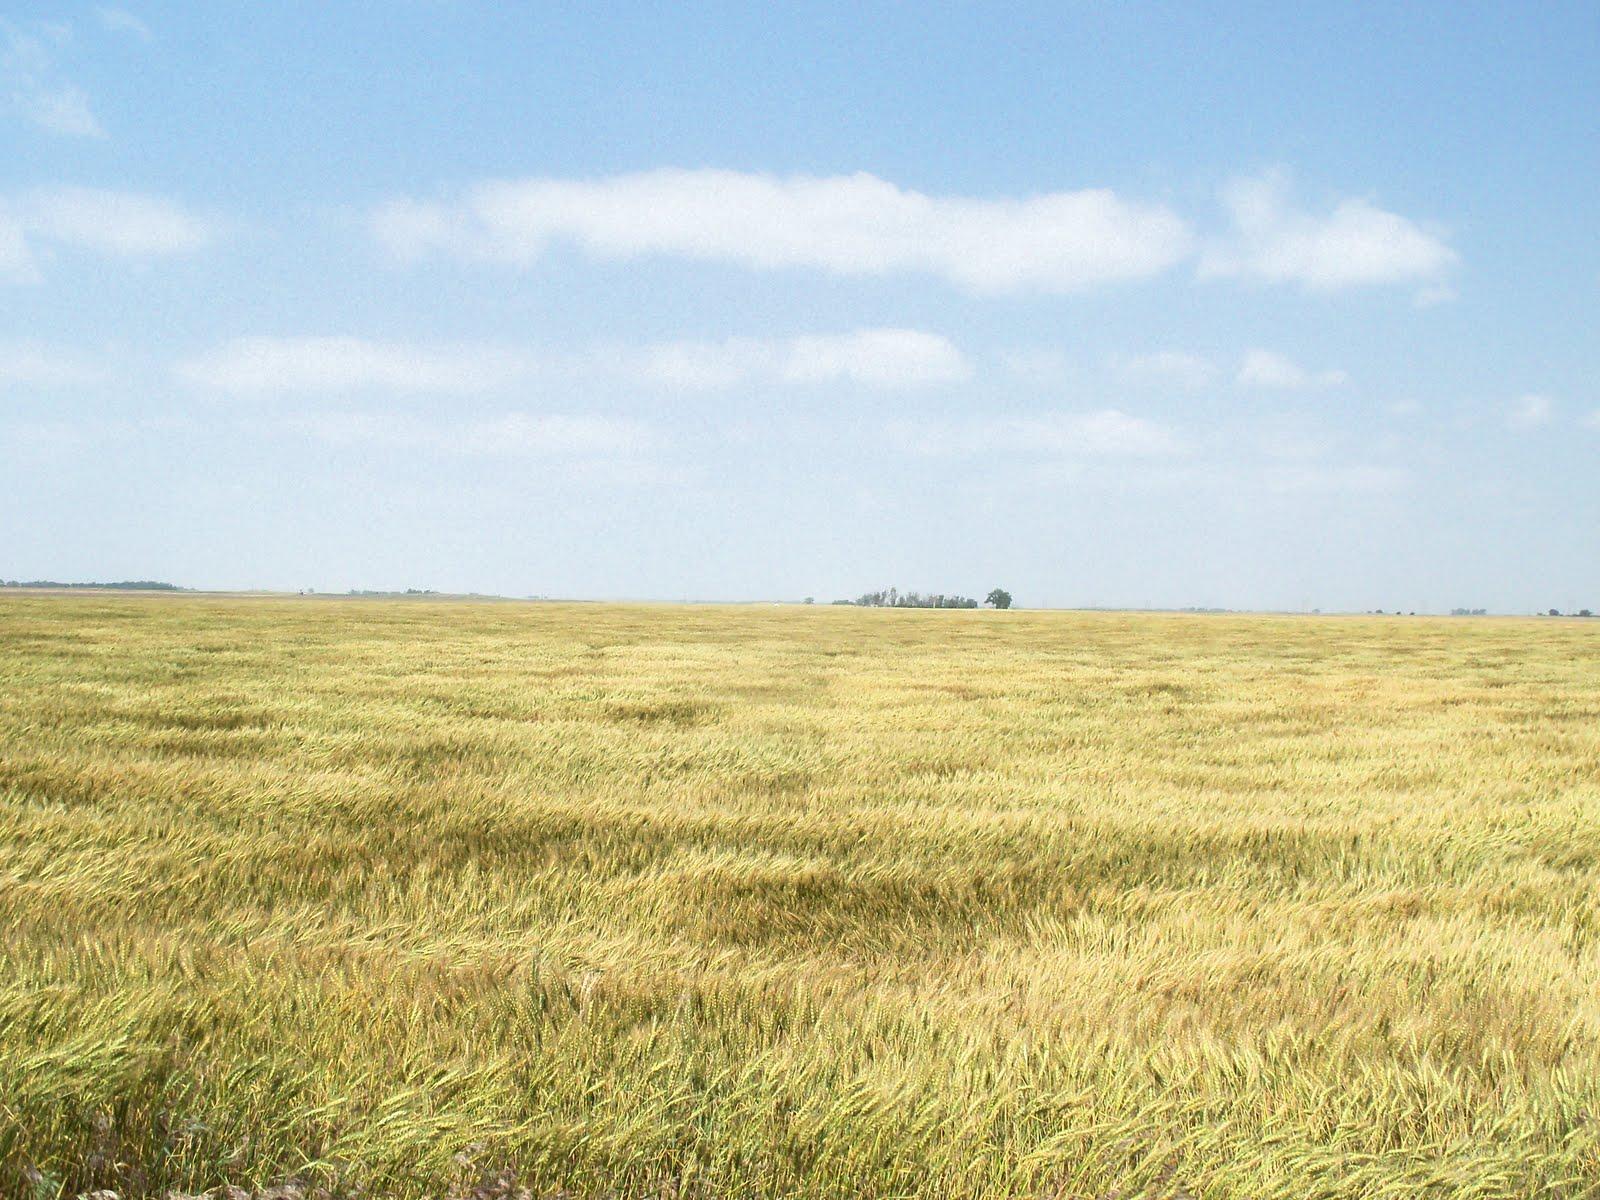 Kim S County Line Amber Waves Of Grain